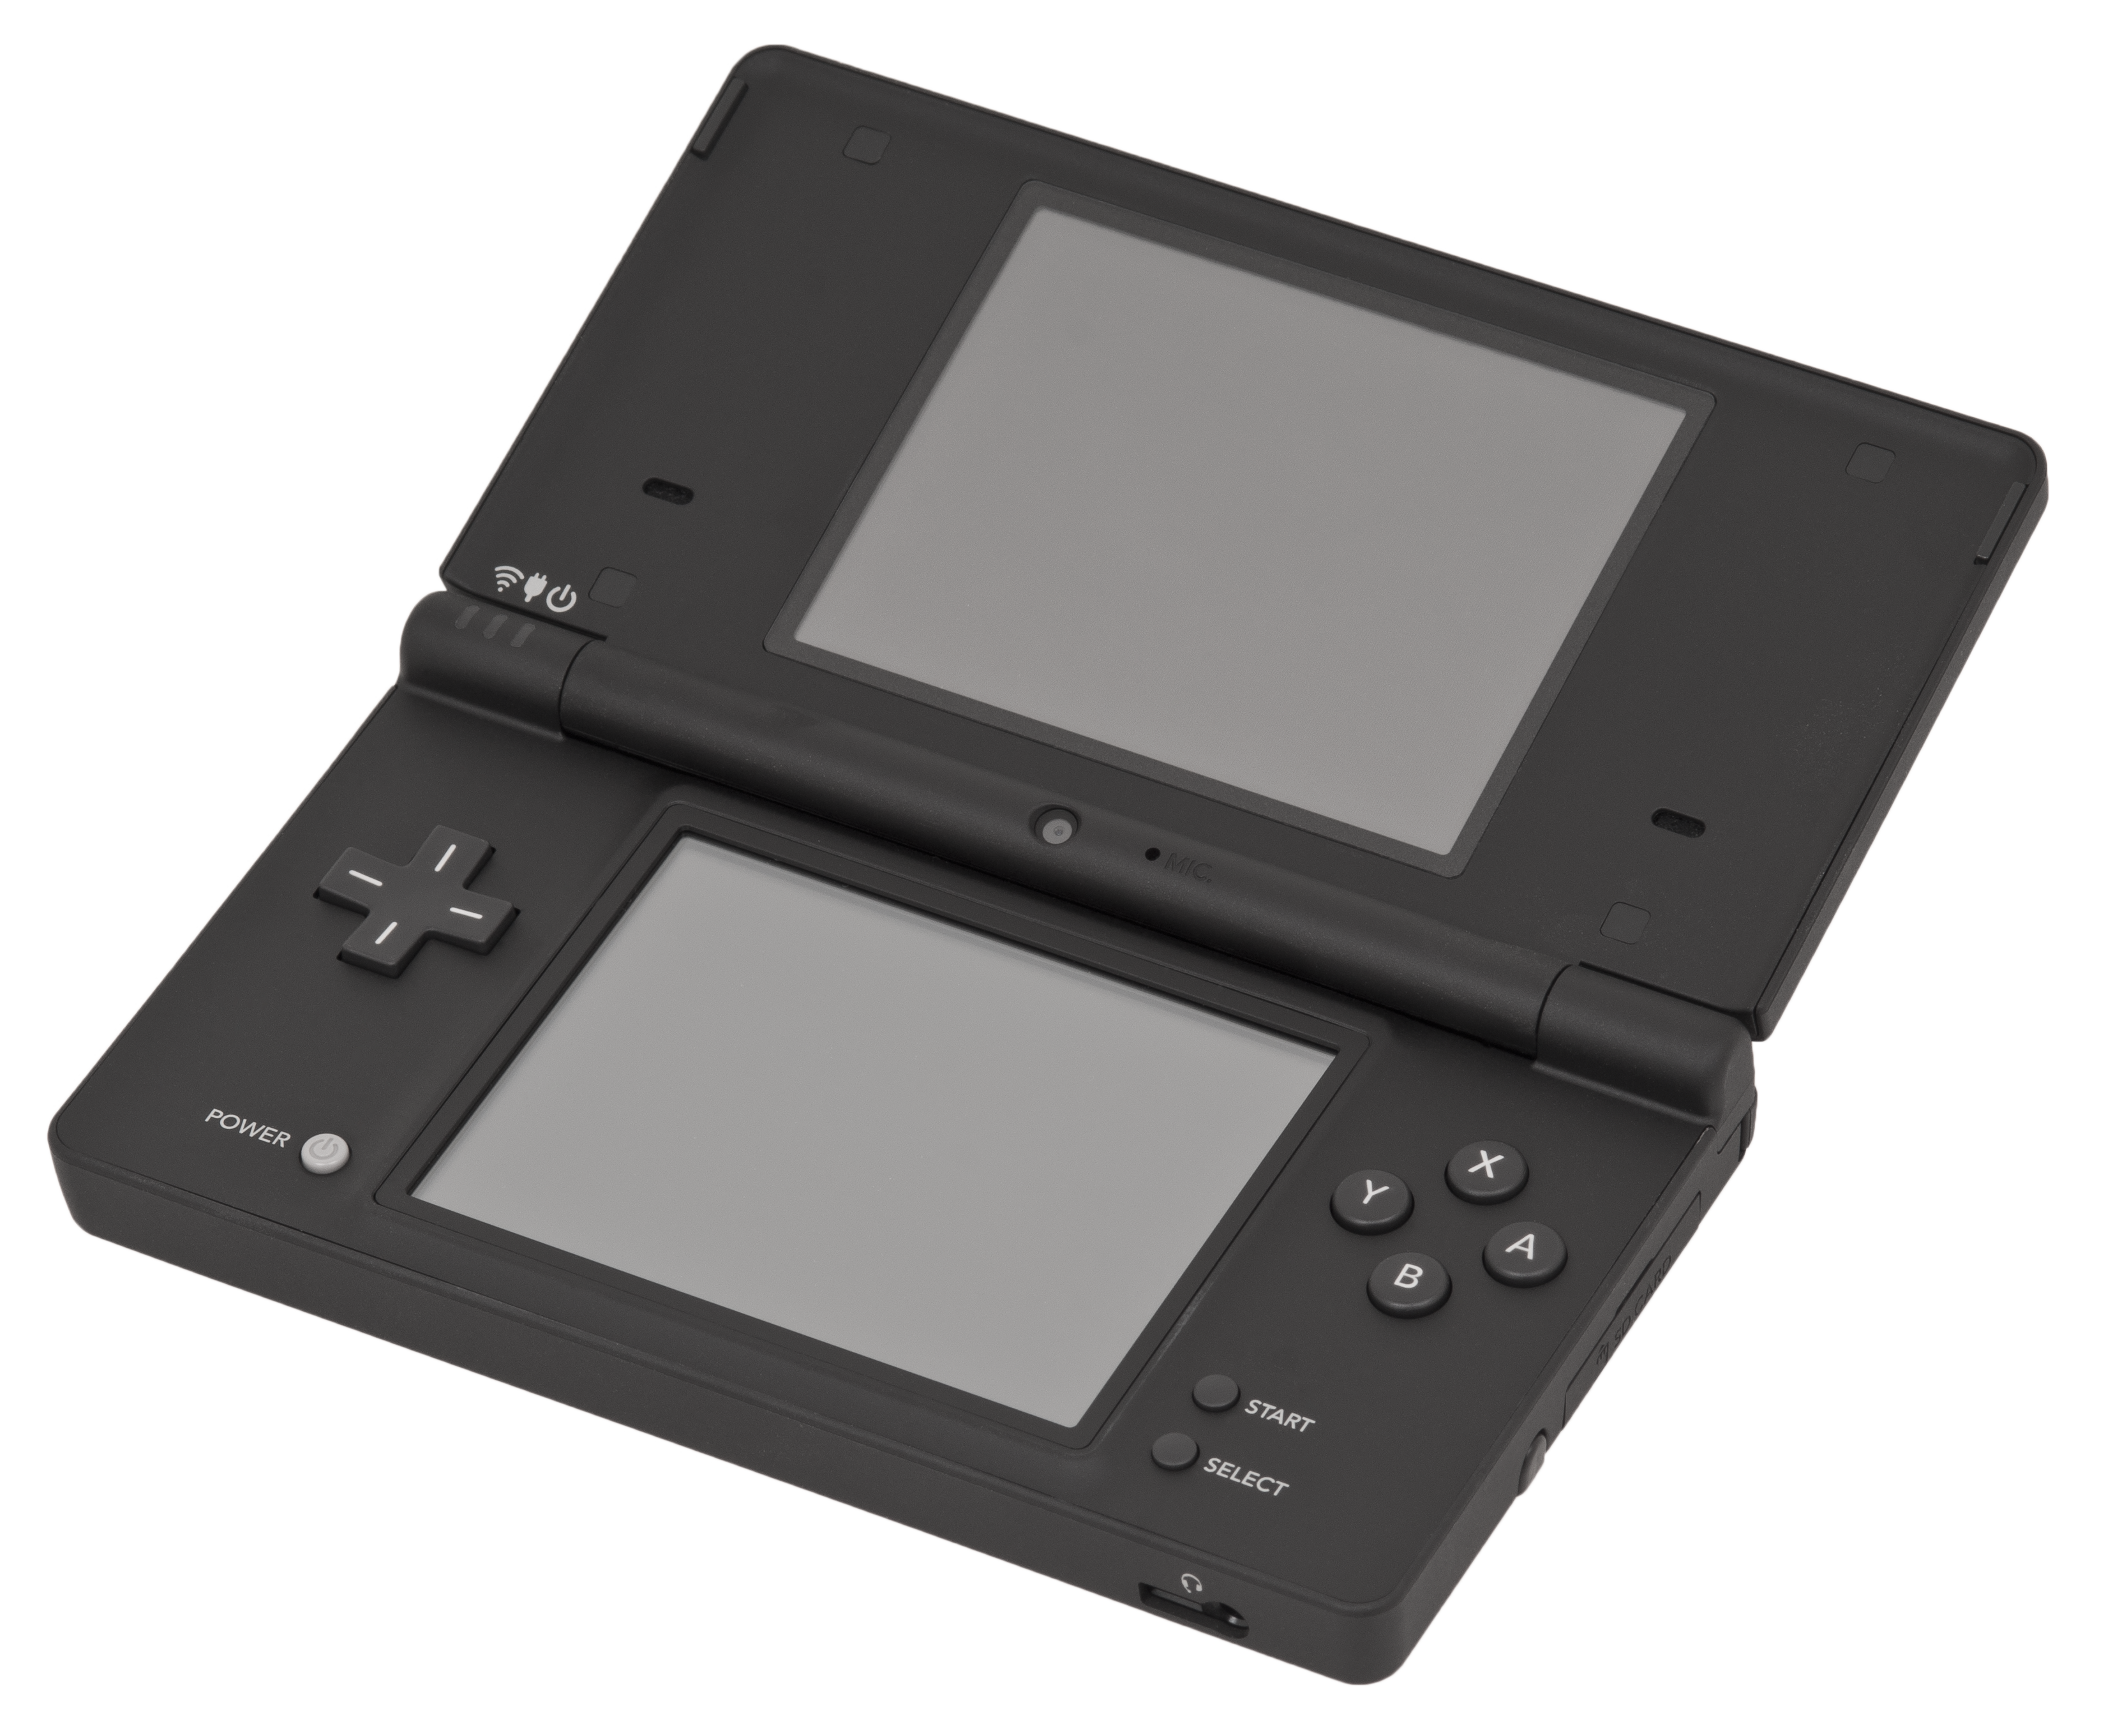 Nintendo Dsi 2008 Nintendo Dsi Nintendo Dsi